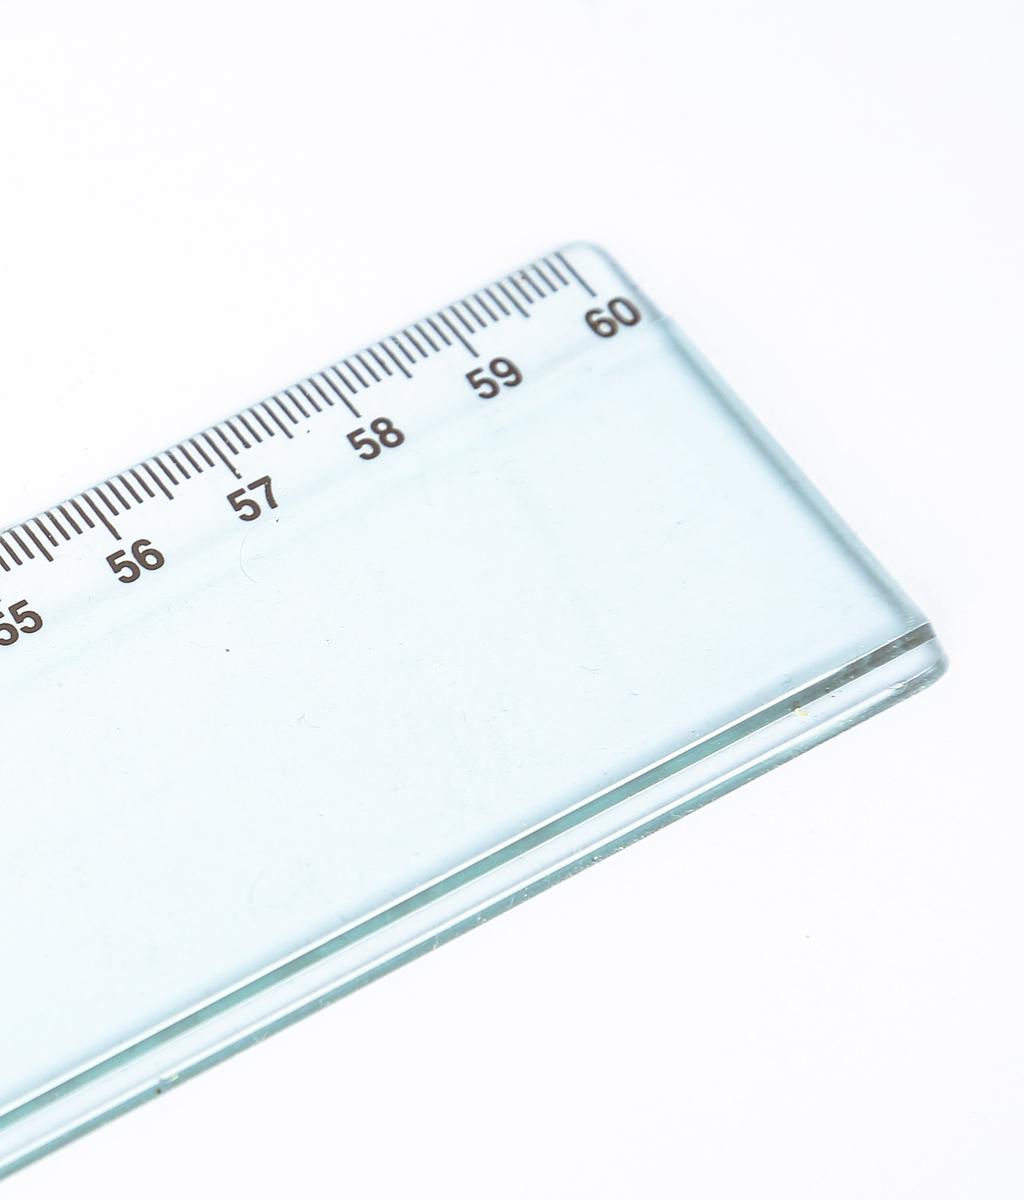 Règle plate 60 cm RP 60